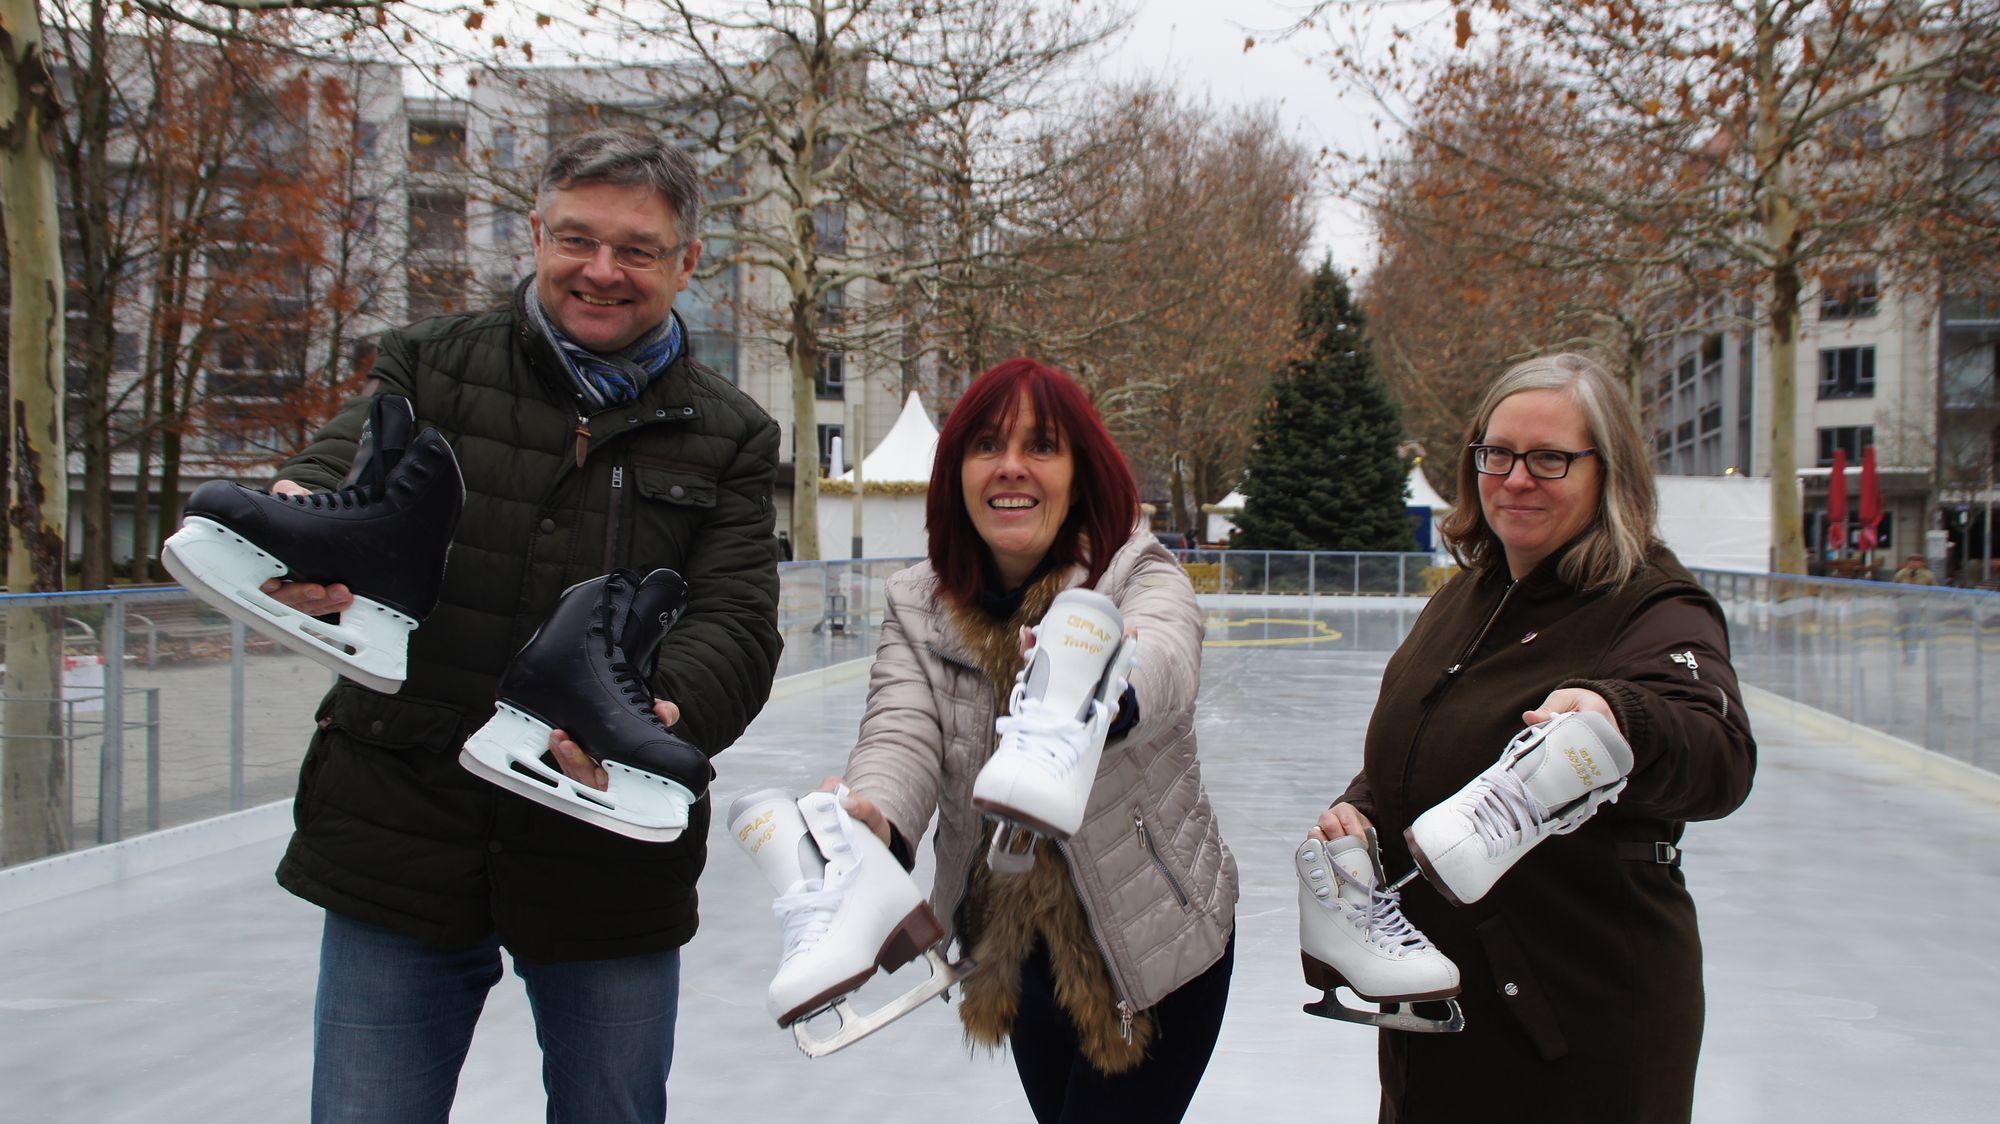 Holger Zastrow, Evelyn Dangrieß, Ulla Wacker